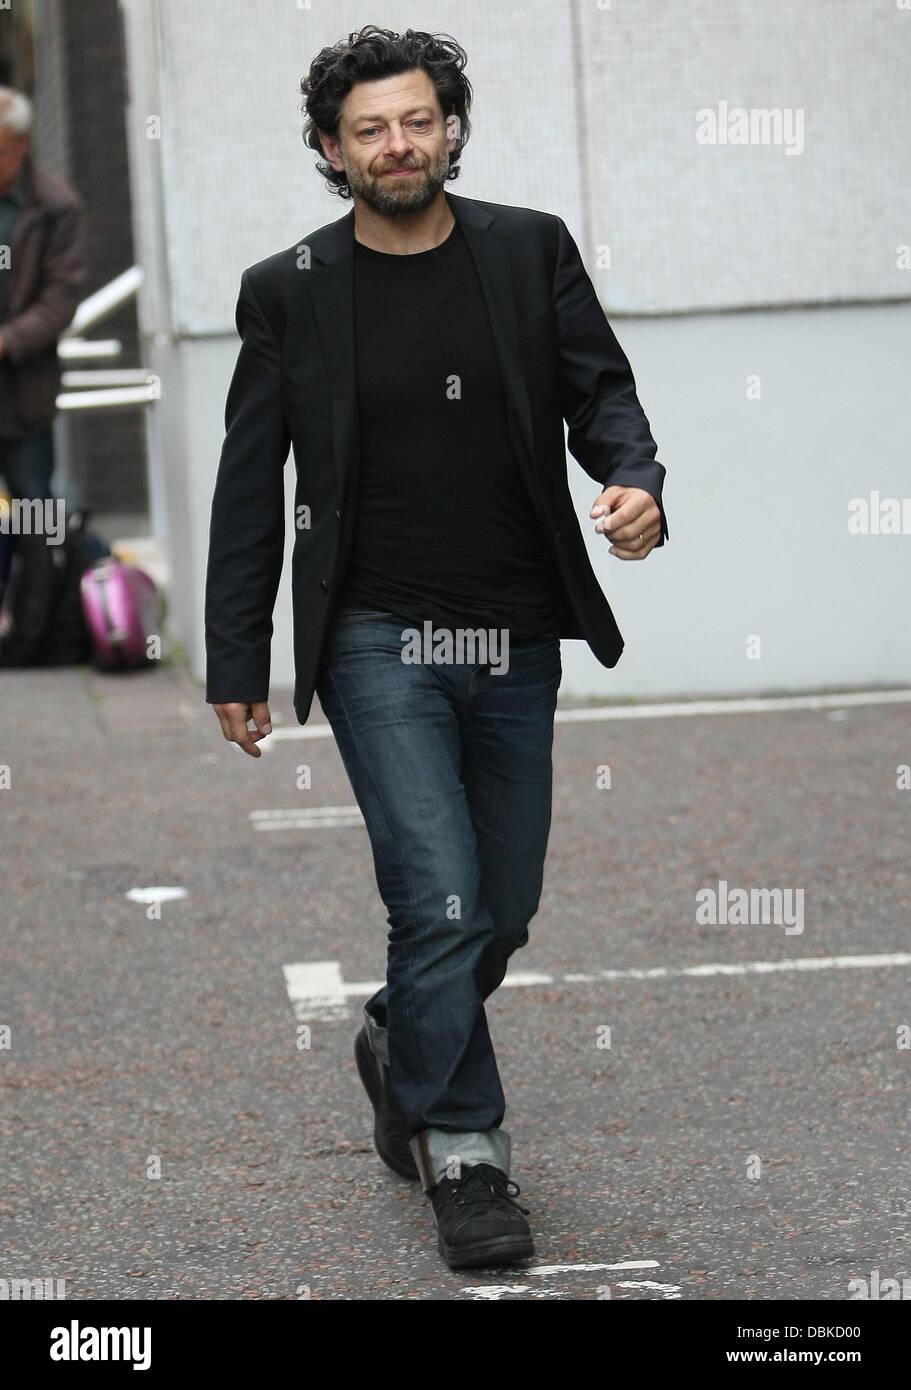 Andy Serkis outside the ITV studios London, England - 04.07.11 - Stock Image